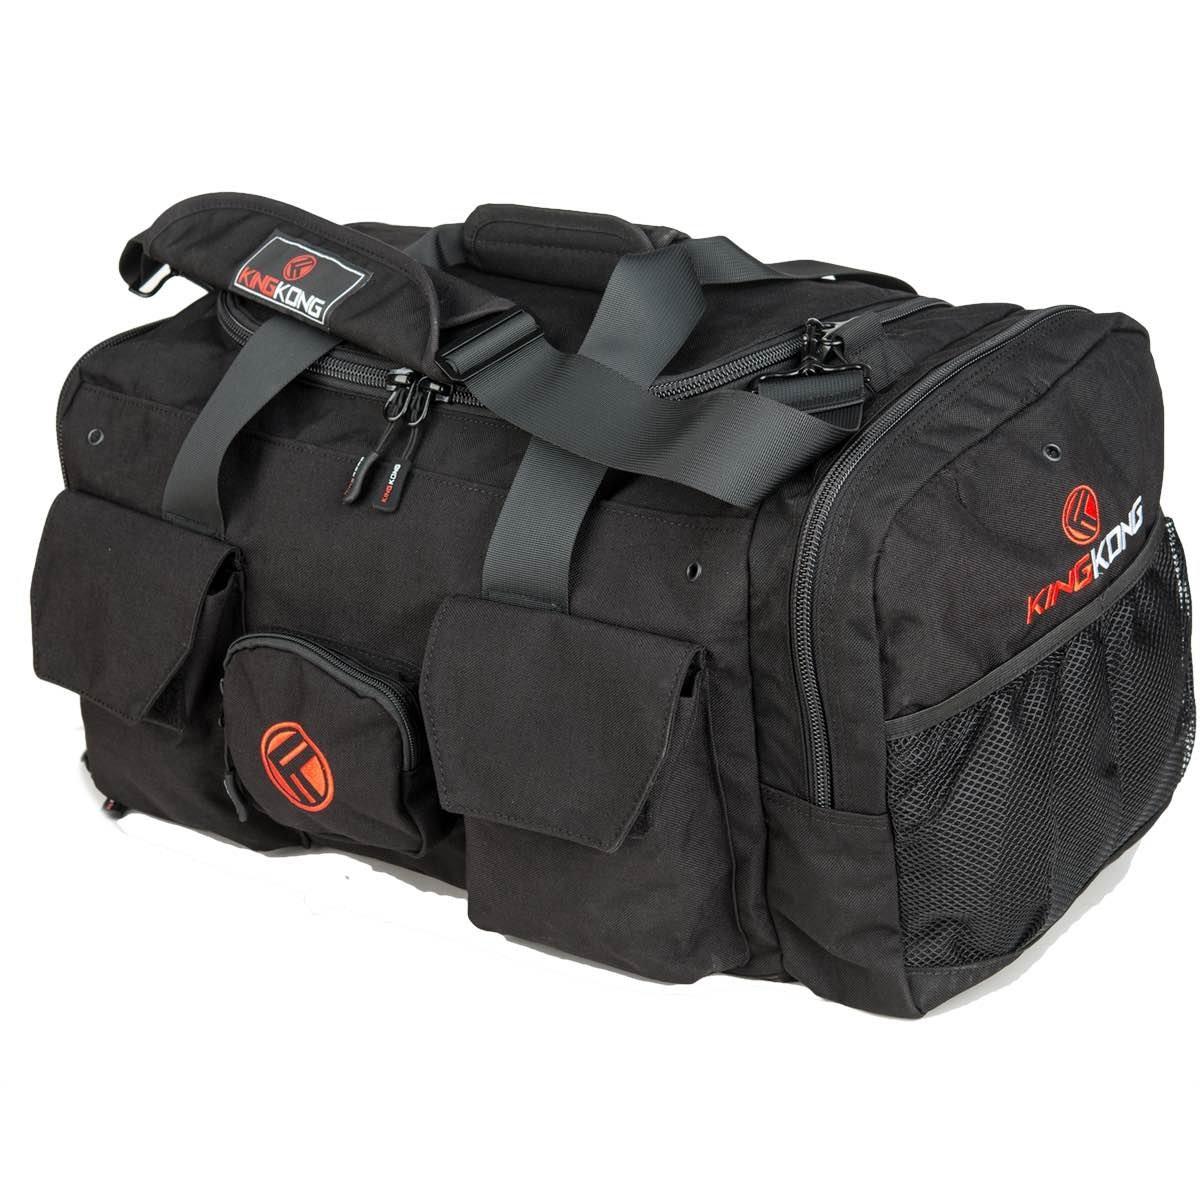 3919188018 Amazon.com   King Kong Original Nylon Gym Bag - Heavy Duty and  Water-Resistant Duffle Bag - Military Spec Nylon- Heavy Duty Steel Buckles  - 20